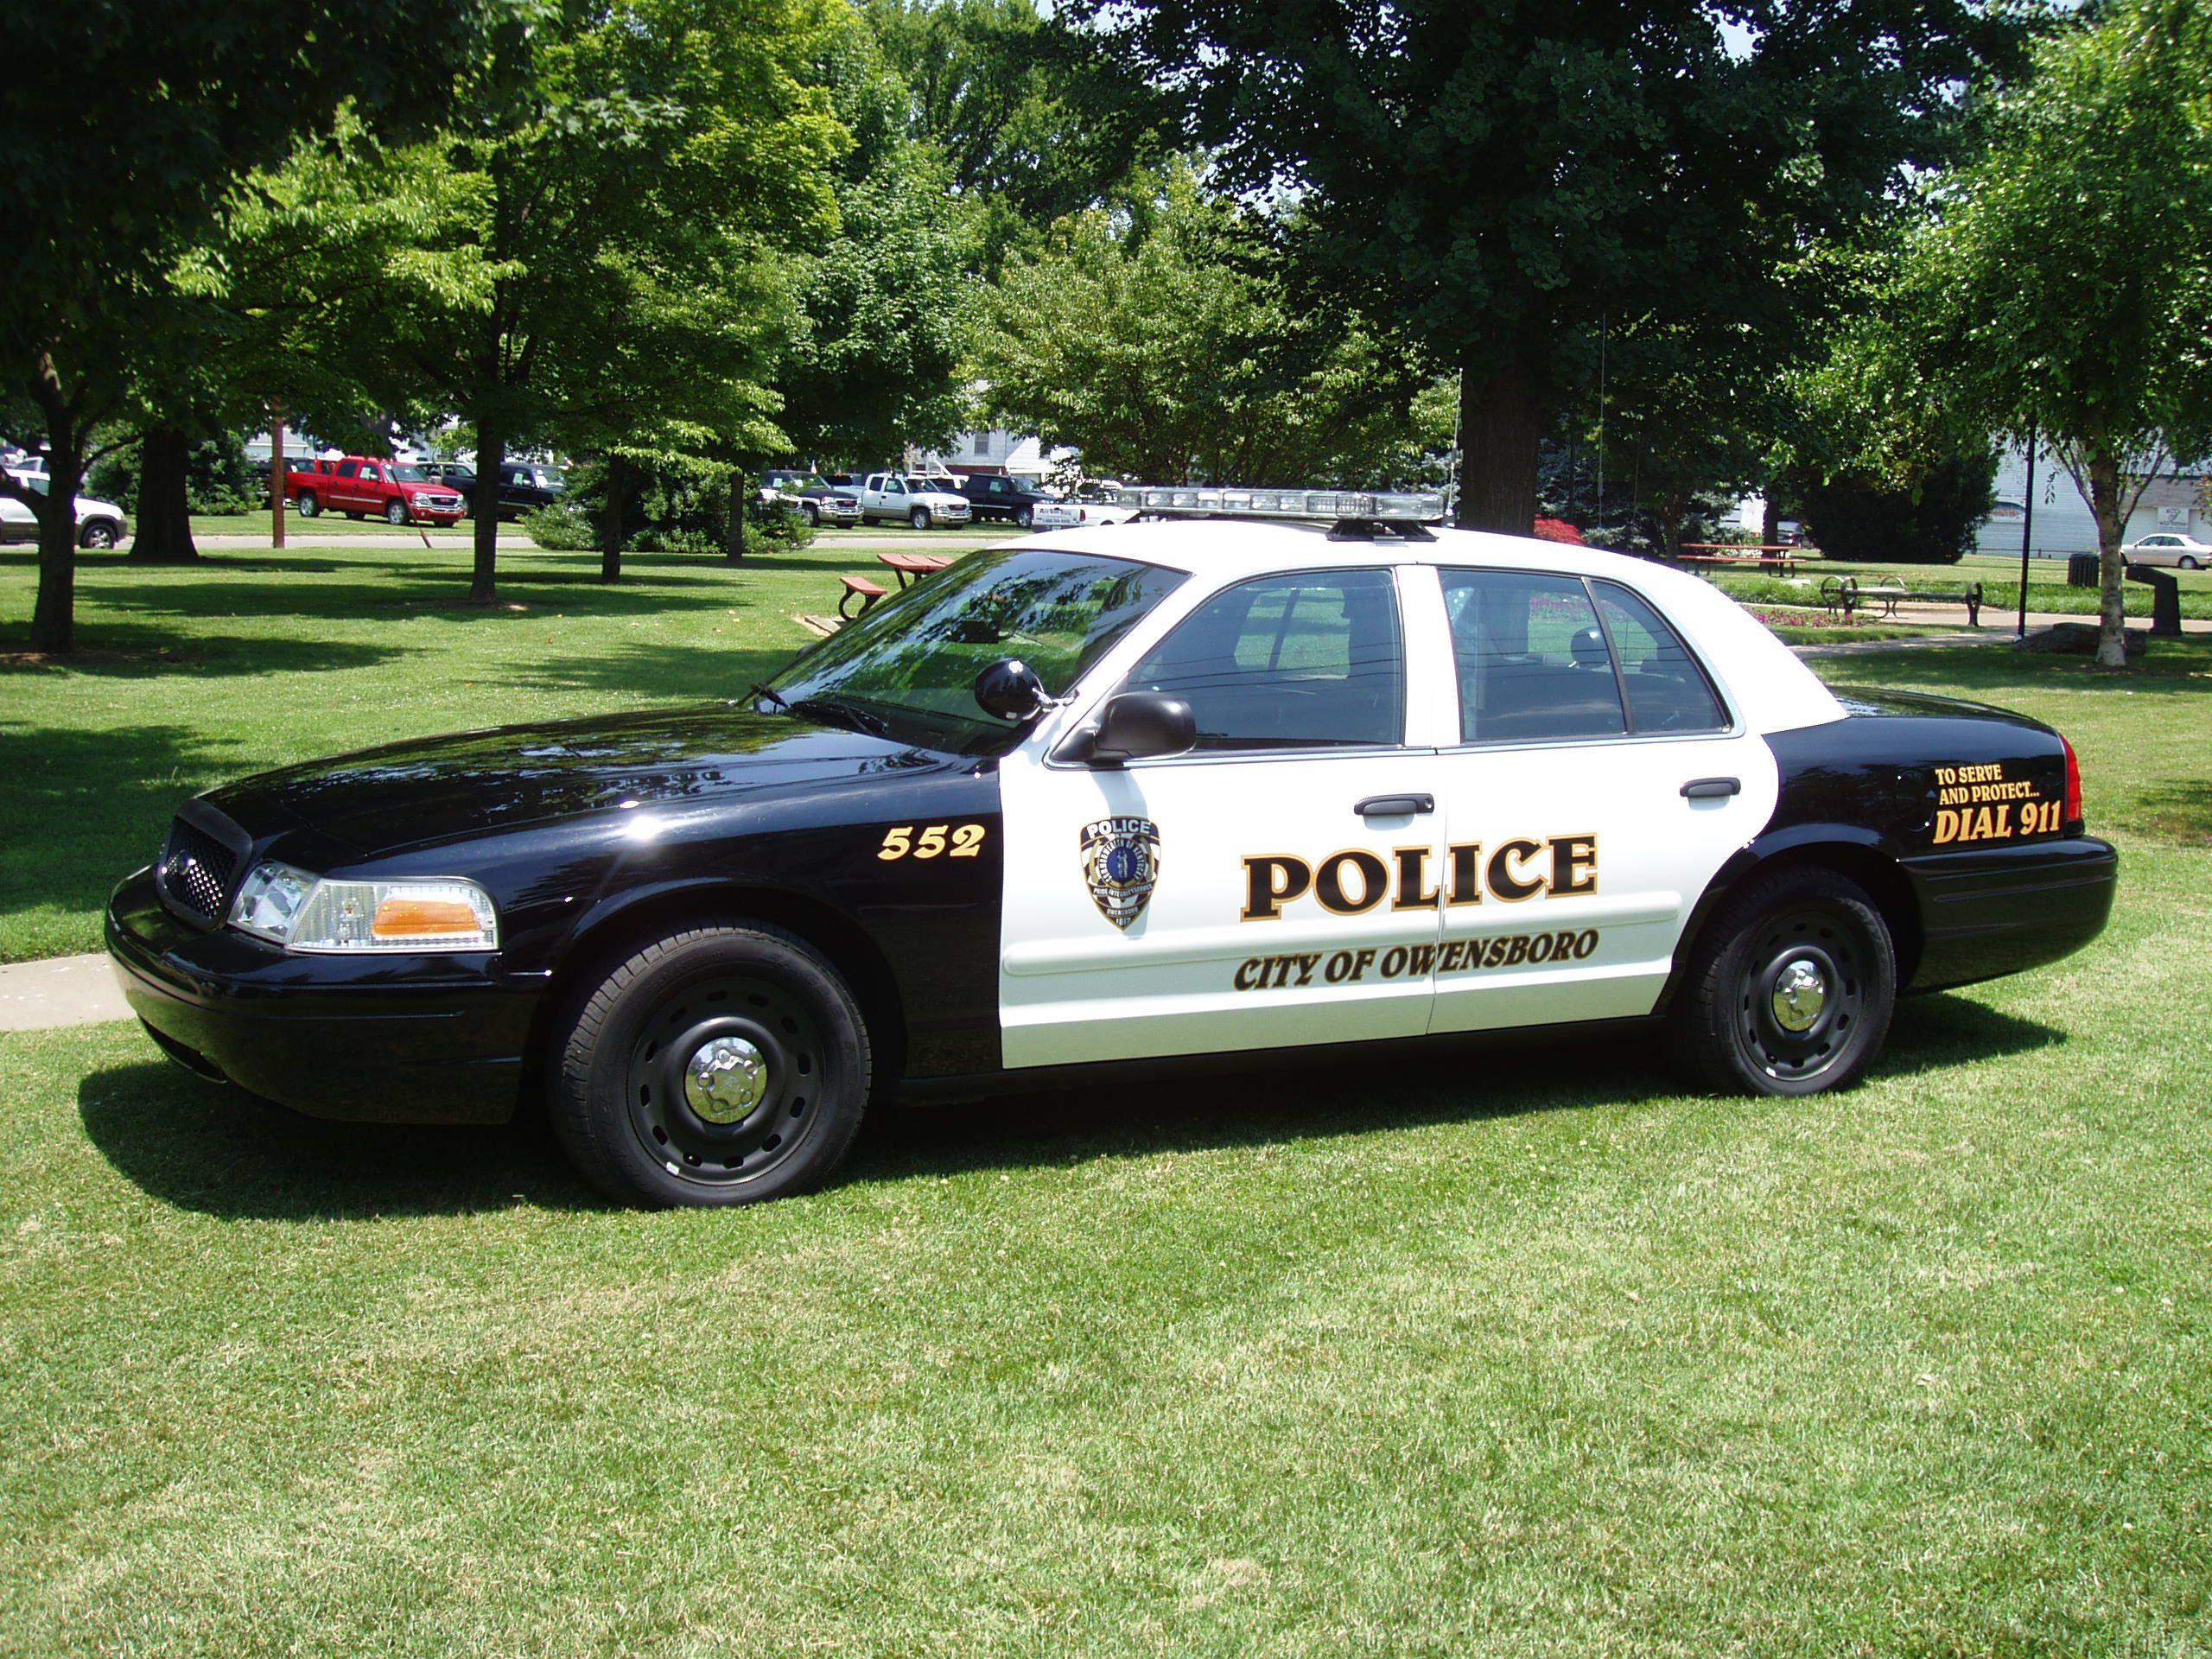 Owensboro Police Department in Owensboro Kentucky